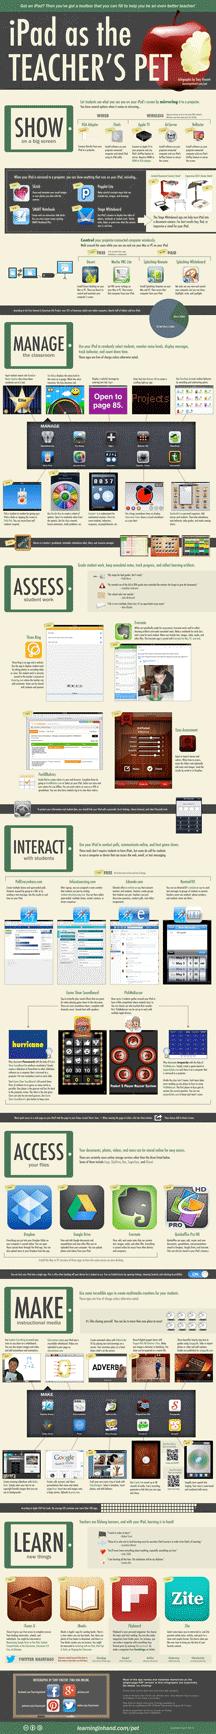 iPad as teachers pet infographic